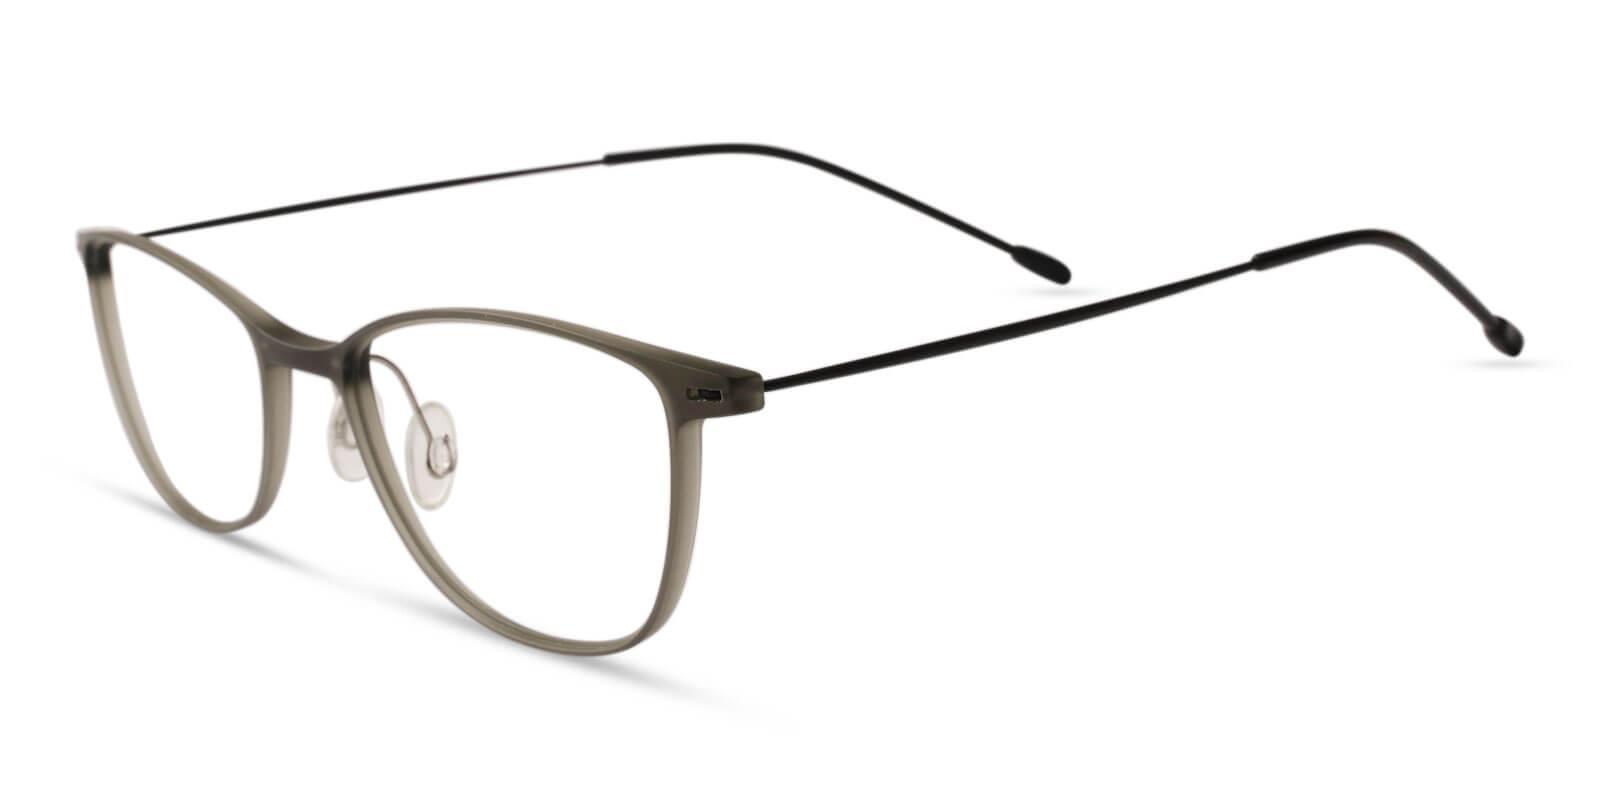 Pridgen Gray Combination NosePads , Eyeglasses , Lightweight Frames from ABBE Glasses